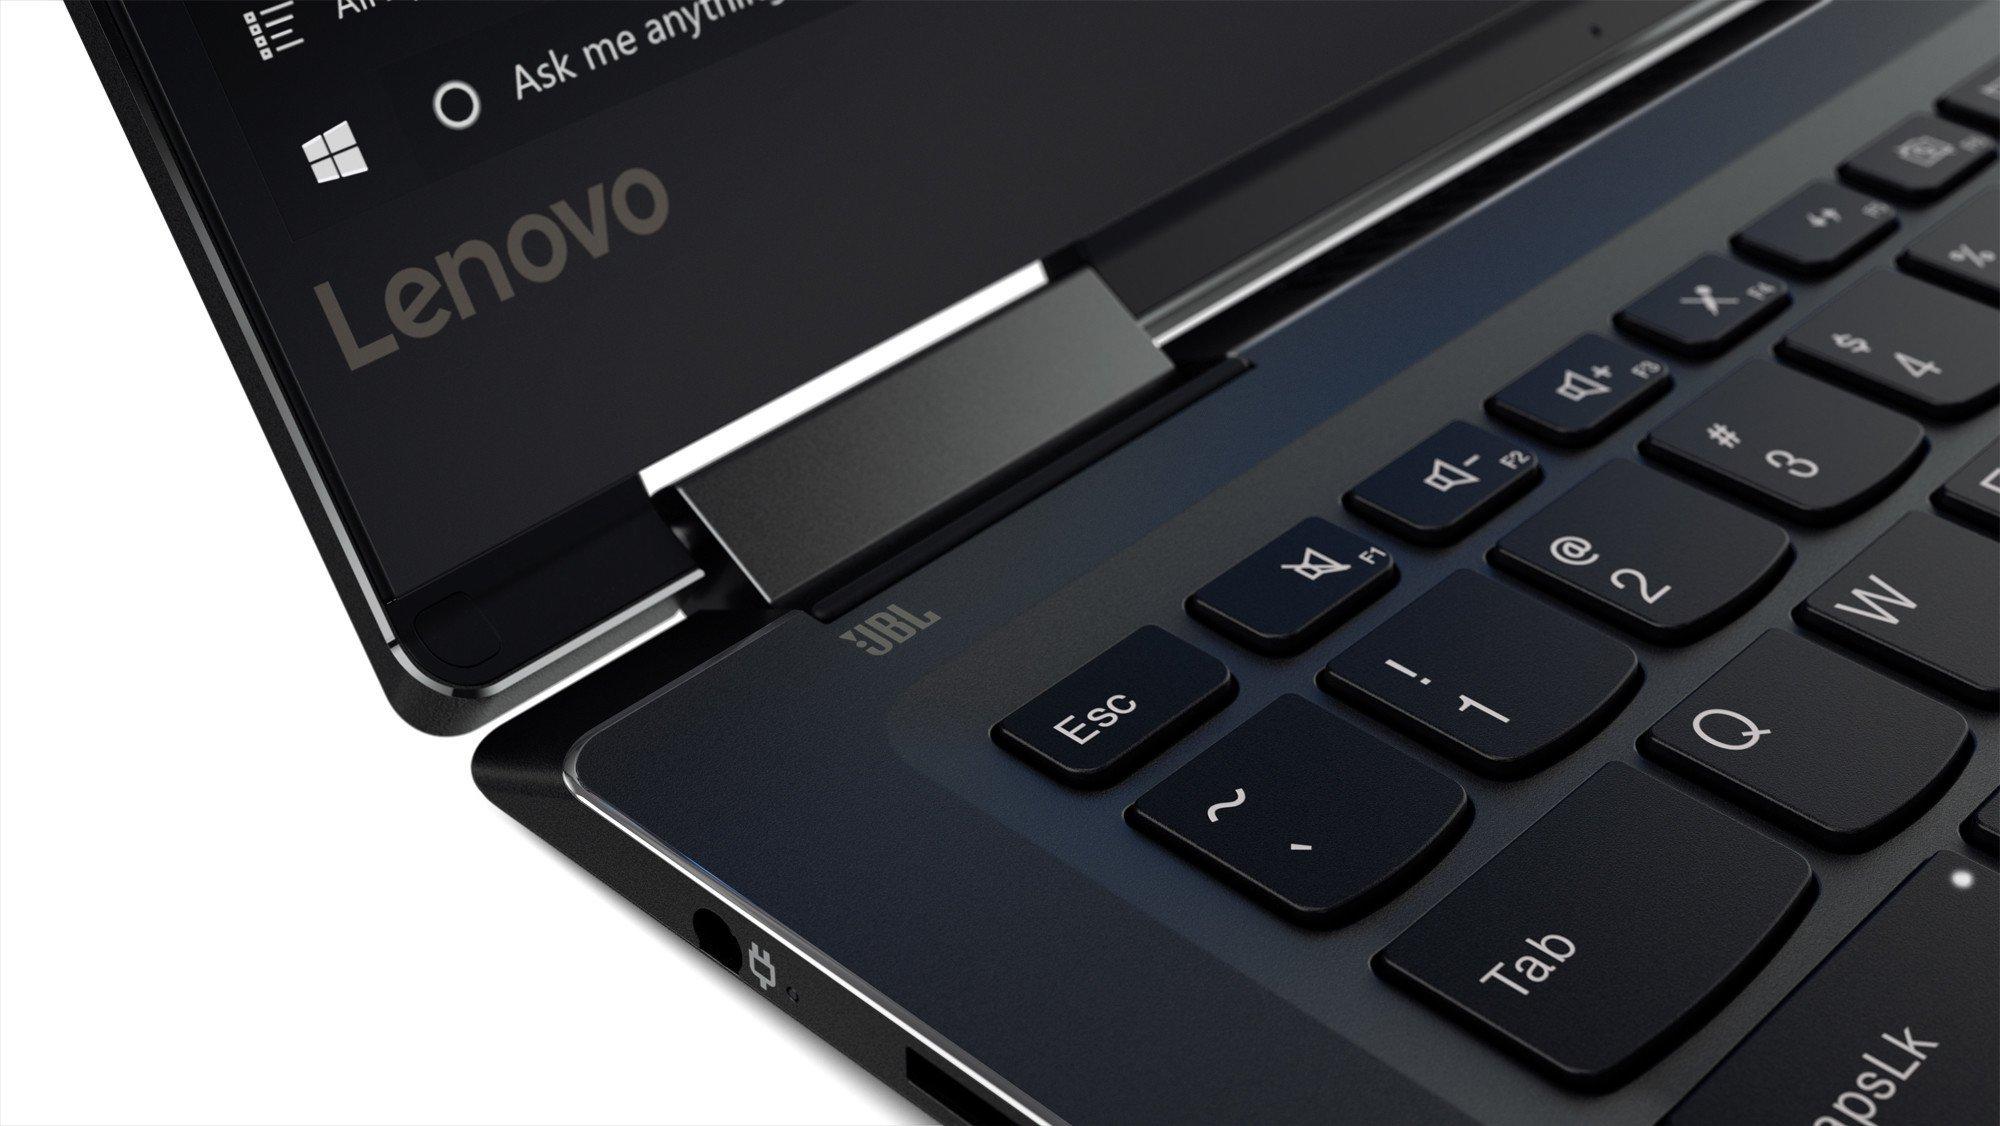 Lenovo anuncia a Miix 510, alternativa mais barata para Microsoft Surface